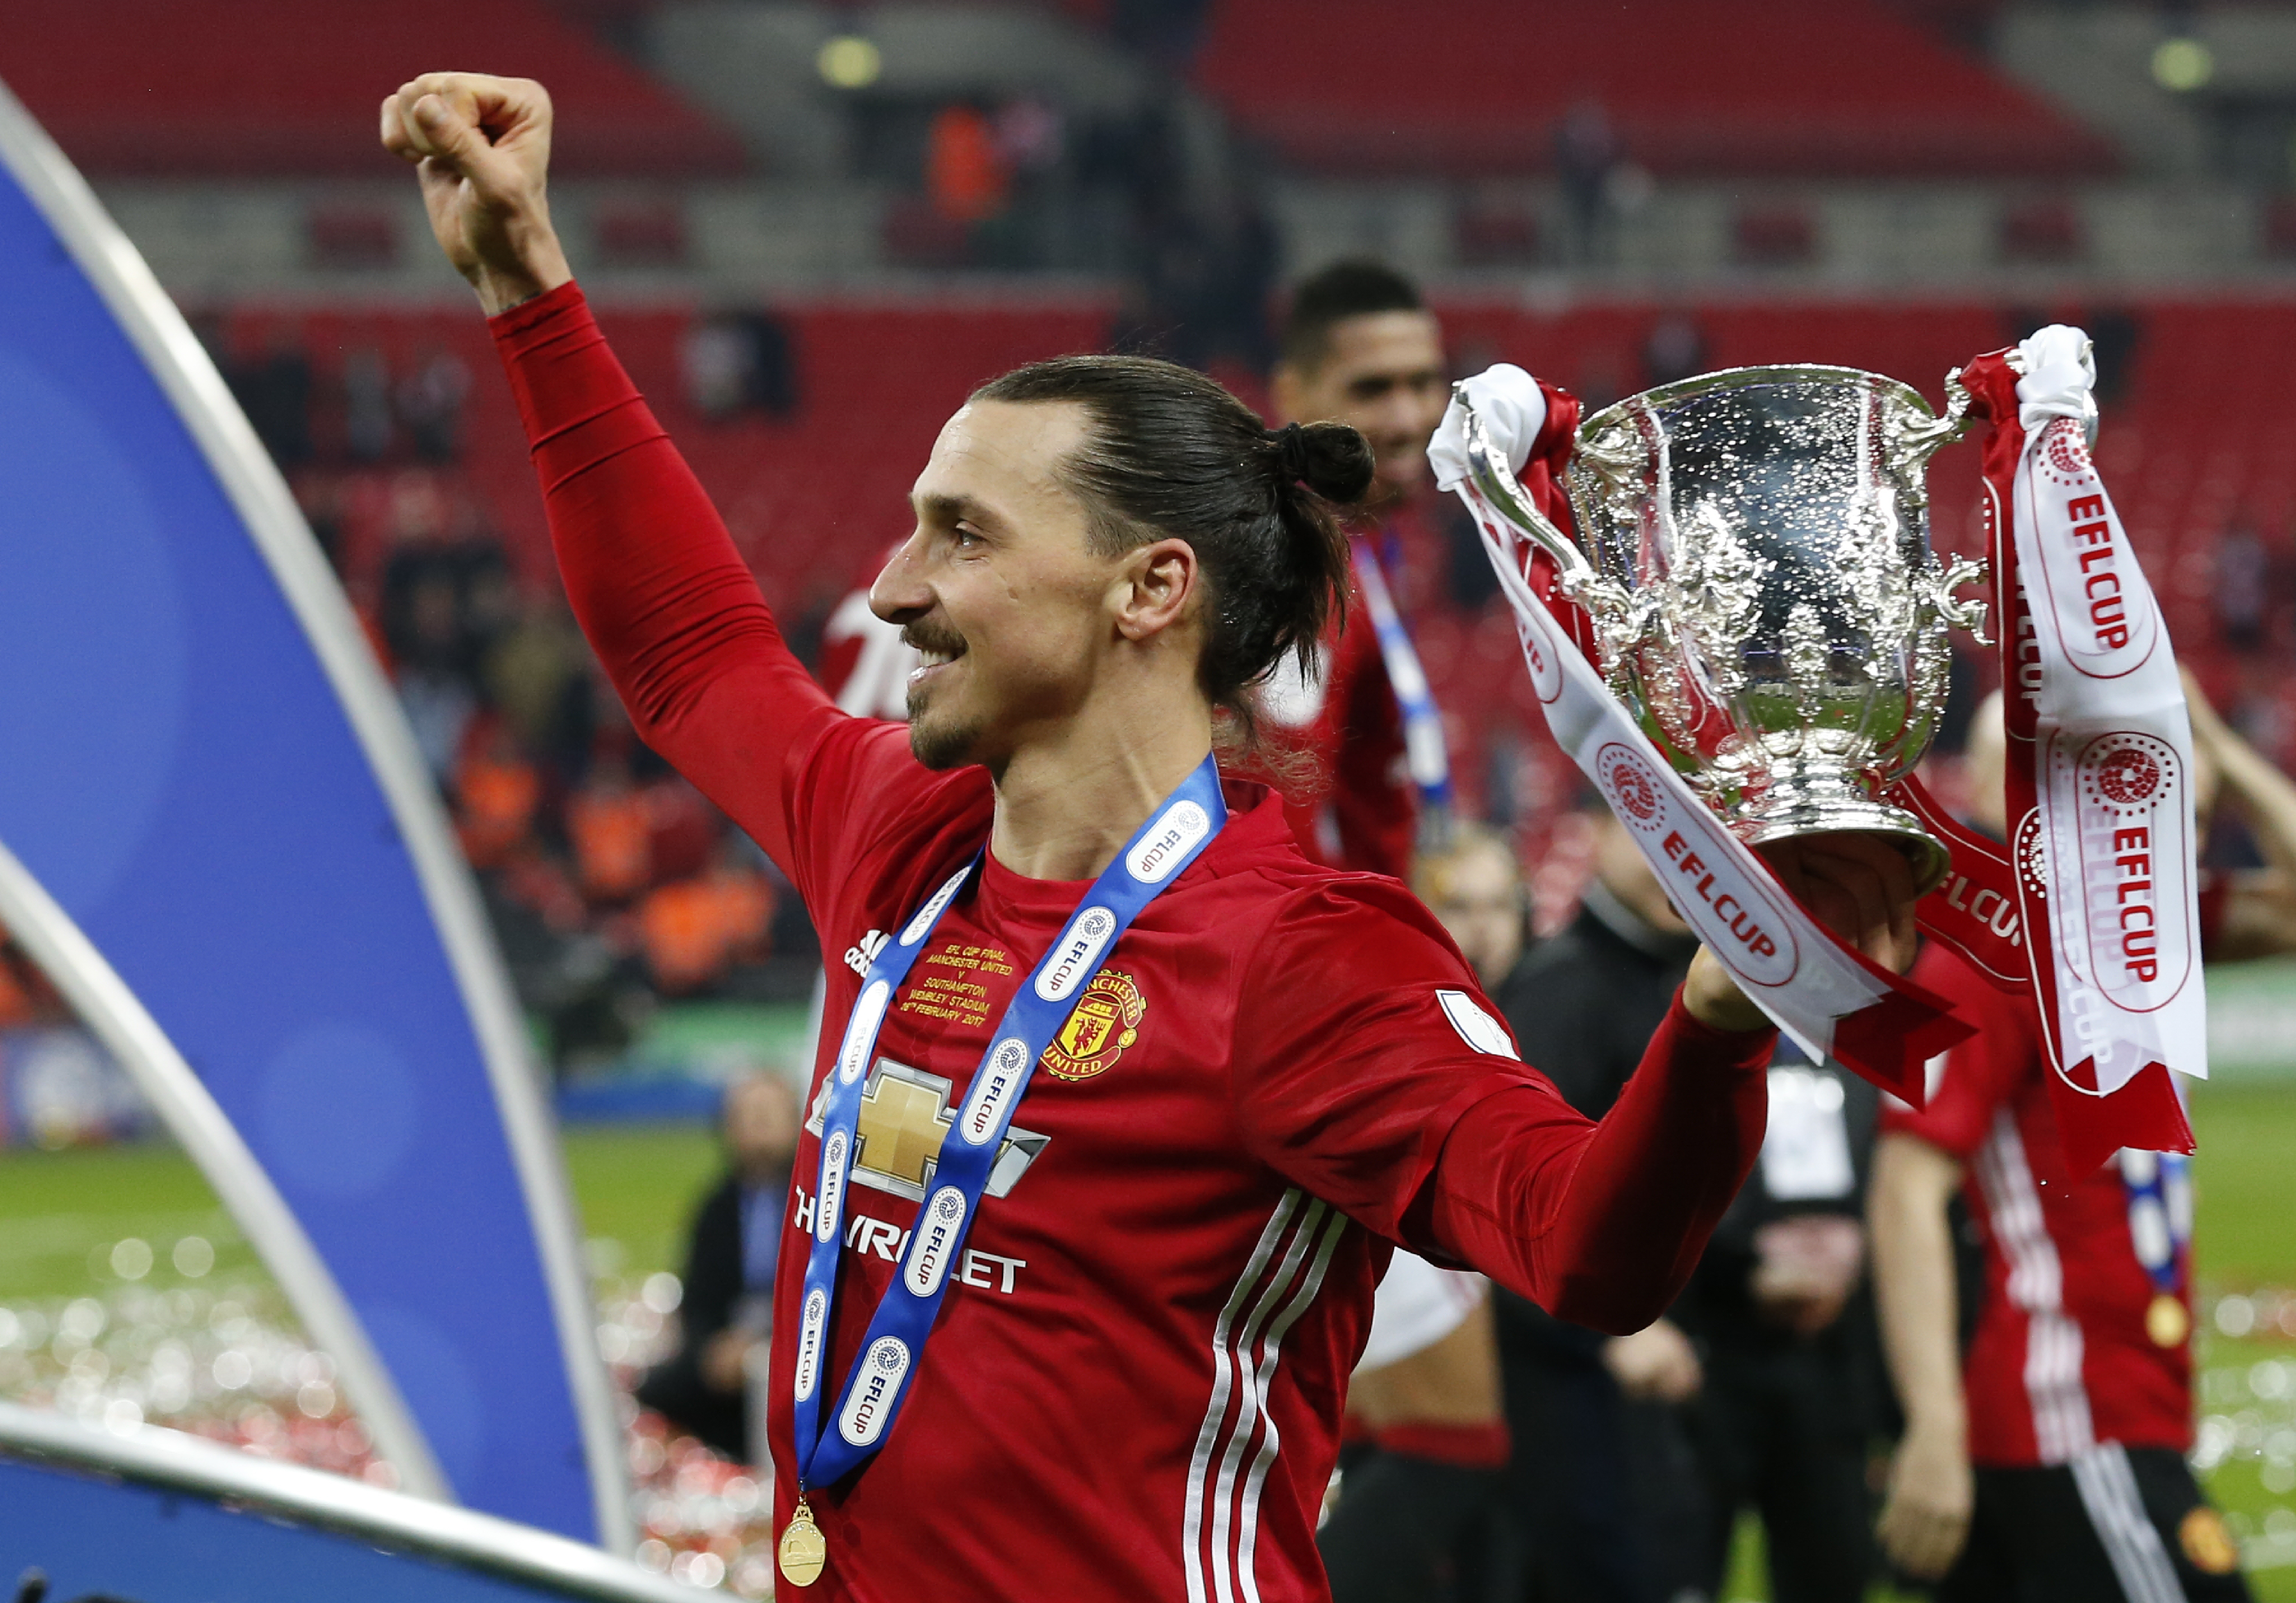 Mais qui es-tu vraiment Zlatan Ibrahimovic ?